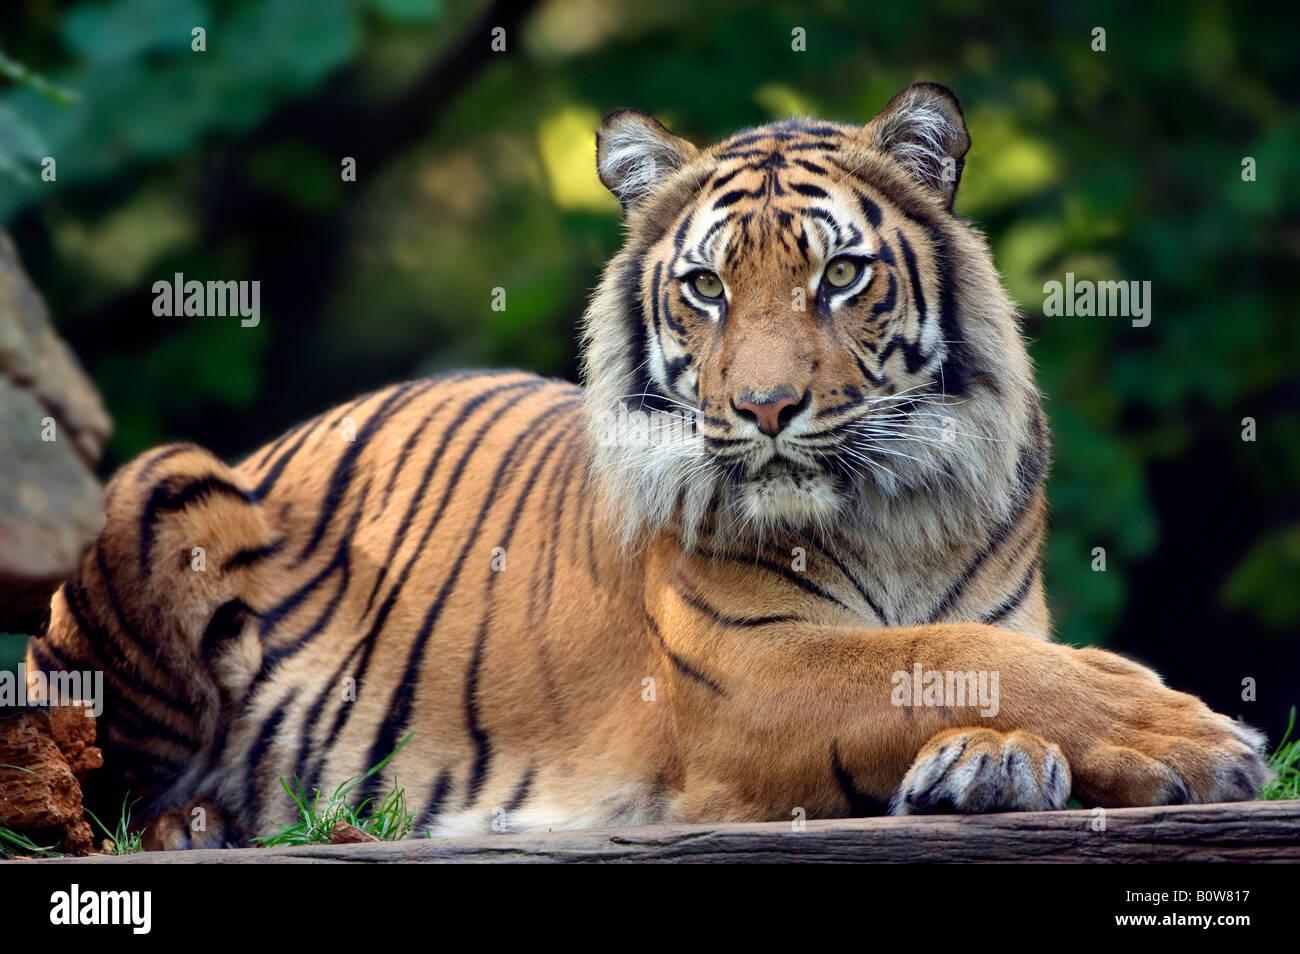 La tigre di Sumatra (Panthera tigris sumatrae) Immagini Stock